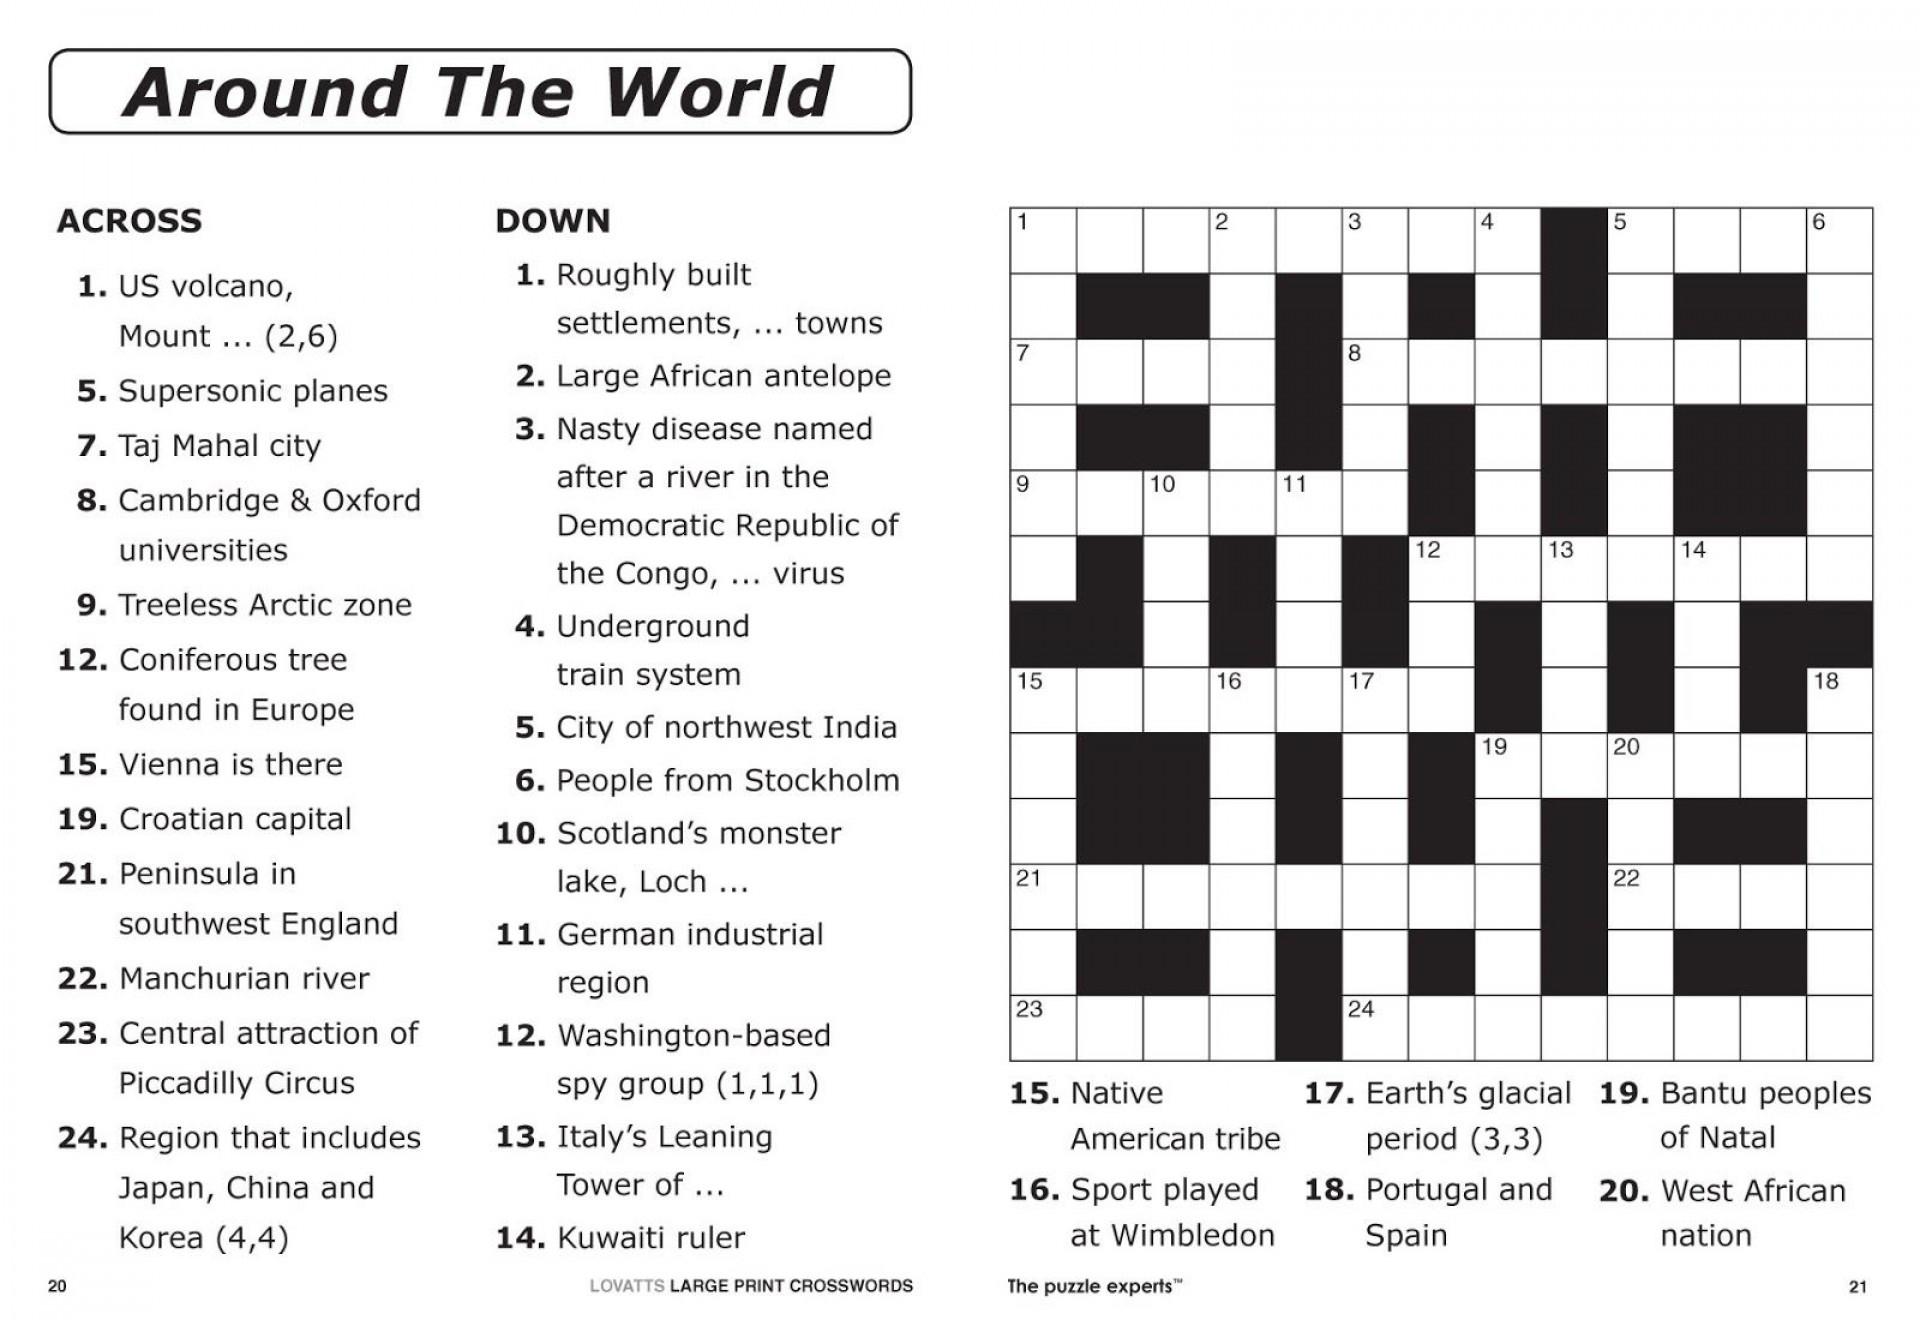 Coloring ~ Coloring Free Large Print Crosswords Easy For Seniors - Printable Joseph Crossword